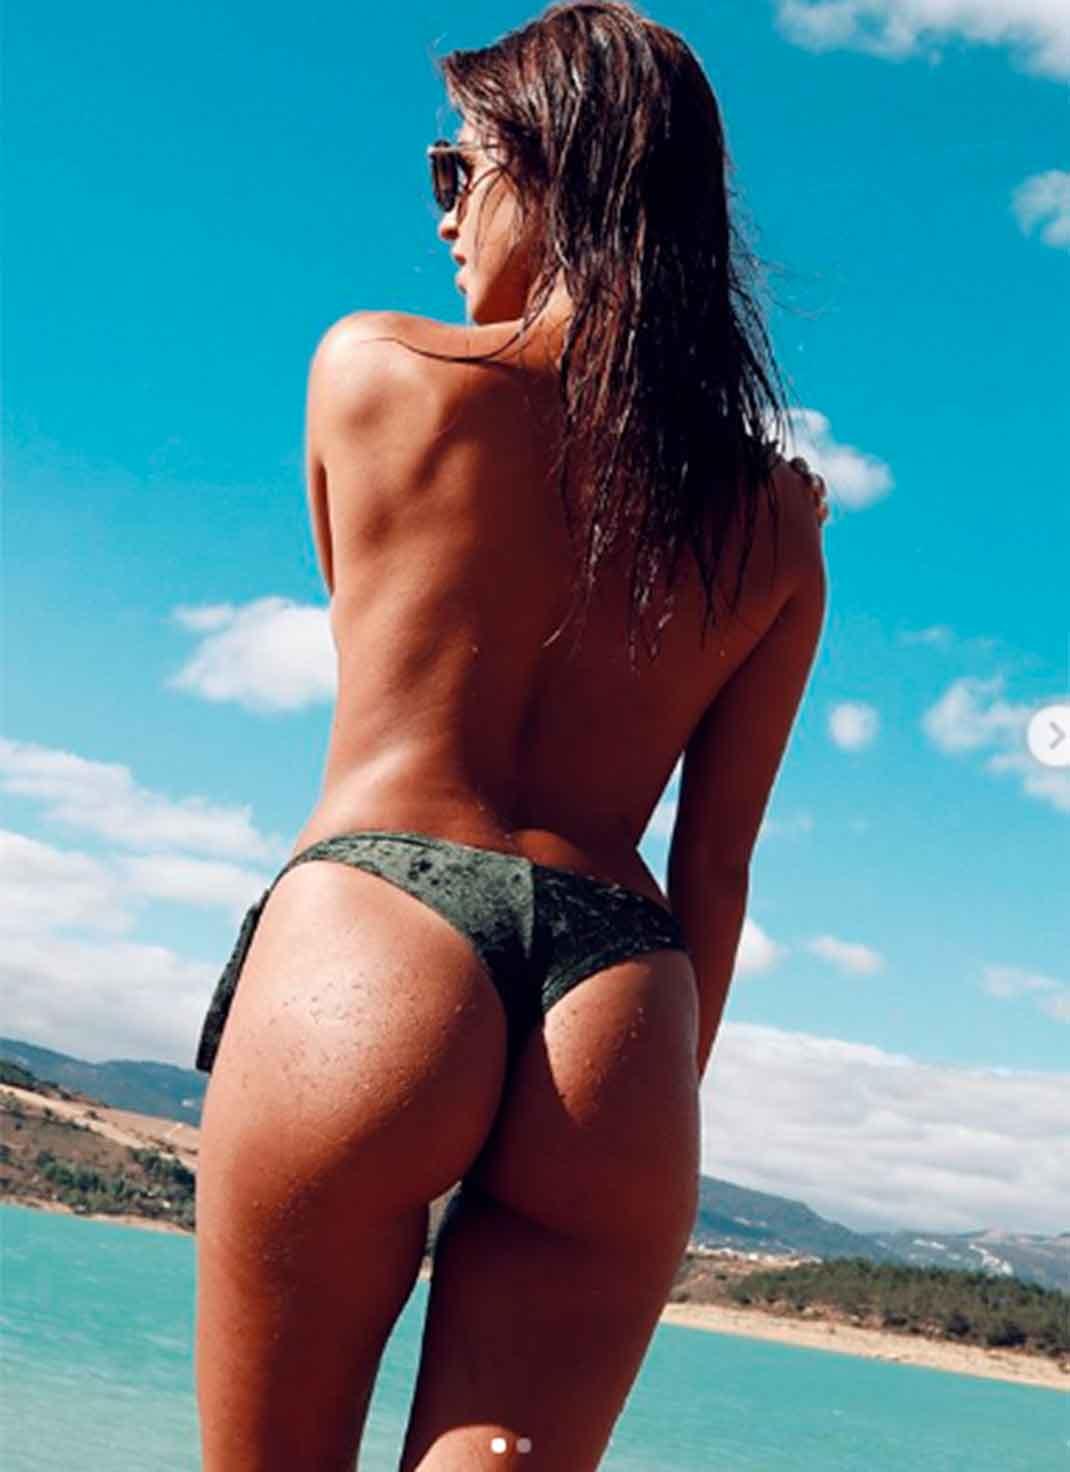 Sofía Suescun Se Desnuda Integralmente En Instagram